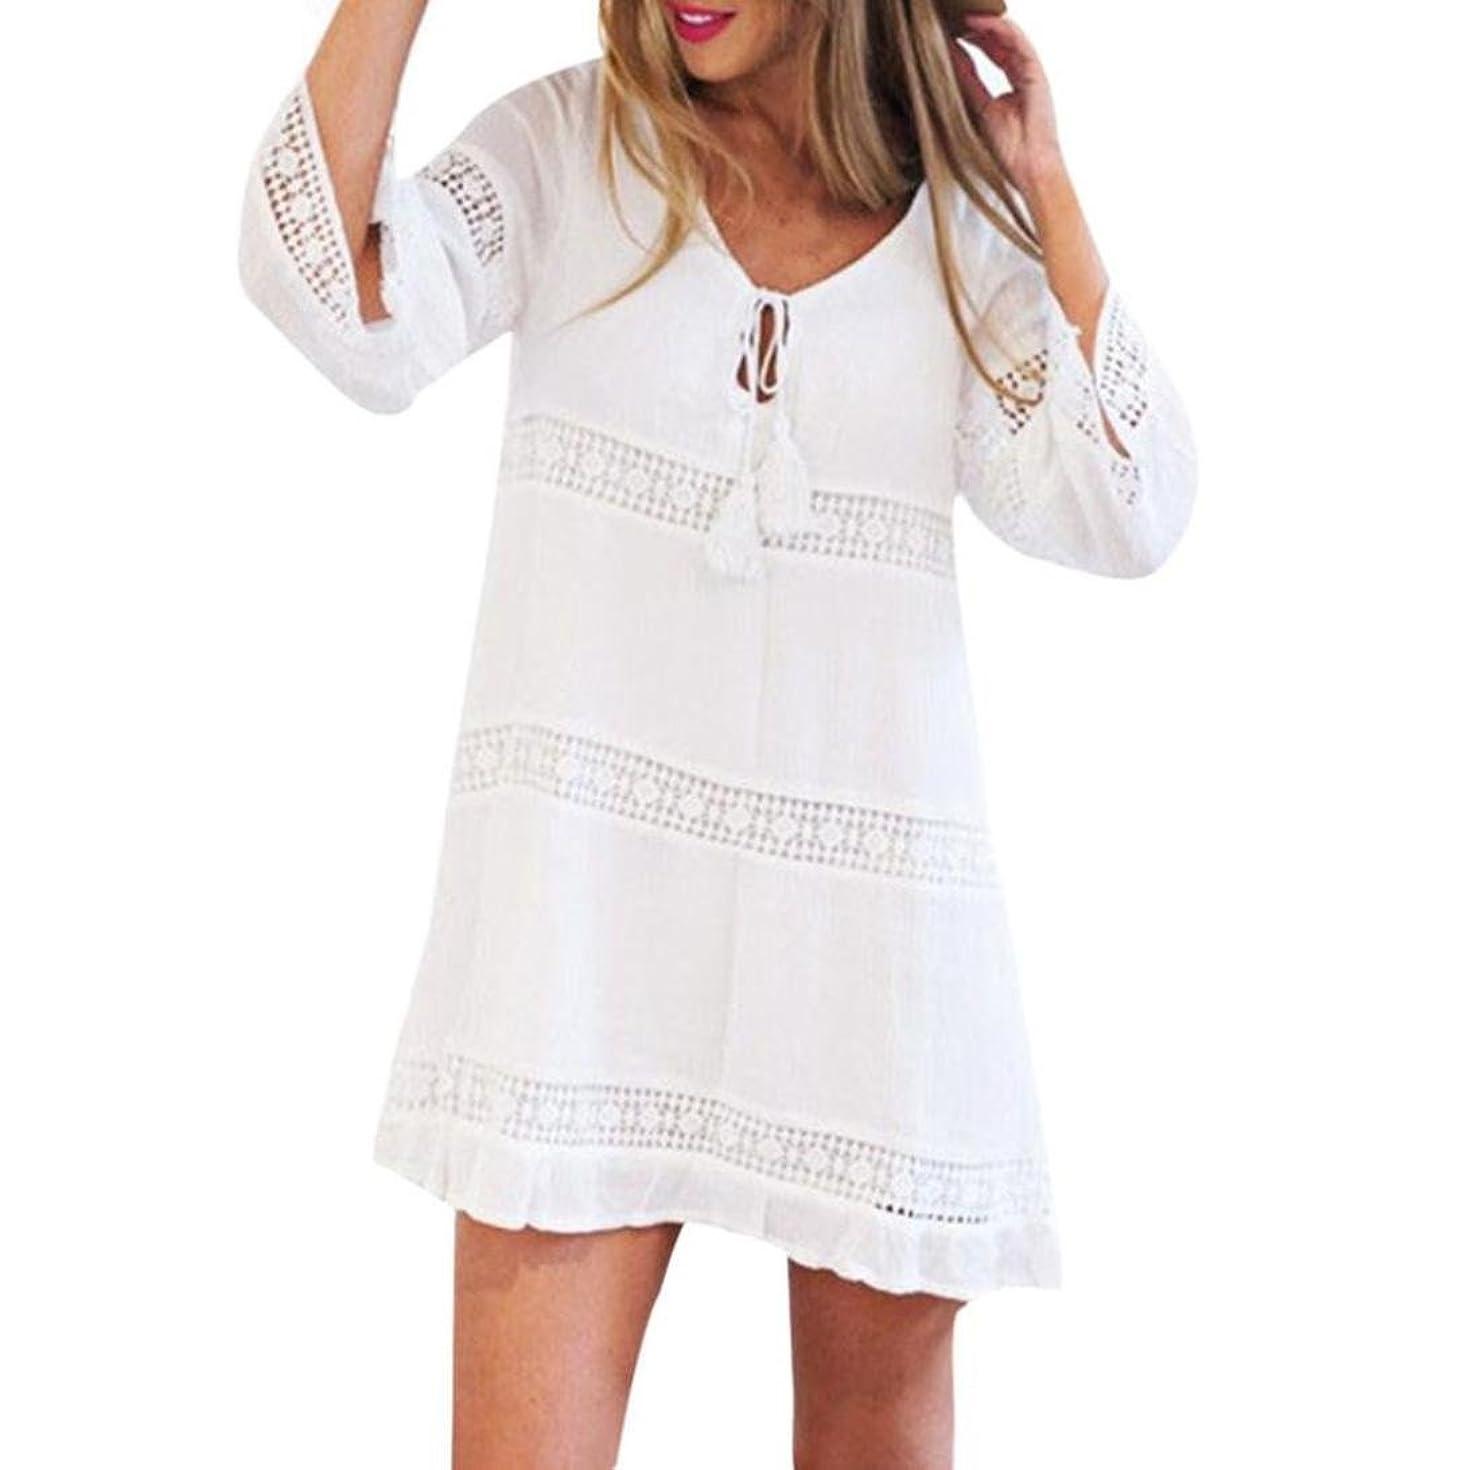 IEason Women Summer Three Quarter Sleeve Loose Lace Boho Beach Short Mini Dress (XS, white)